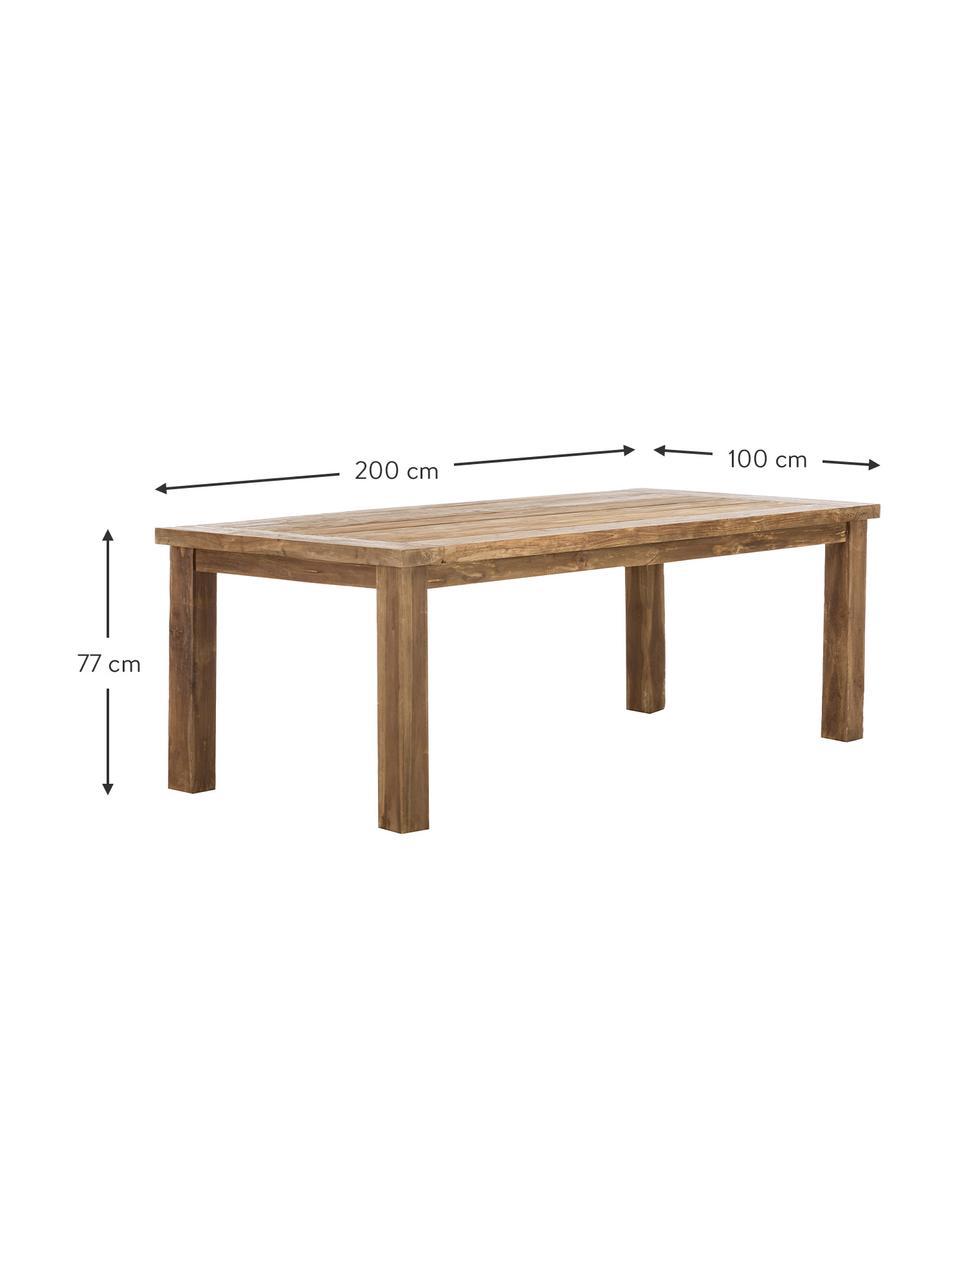 Massivholz Esstisch Bois, Massives Teakholz, unbehandelt, Teak, B 200 x T 100 cm